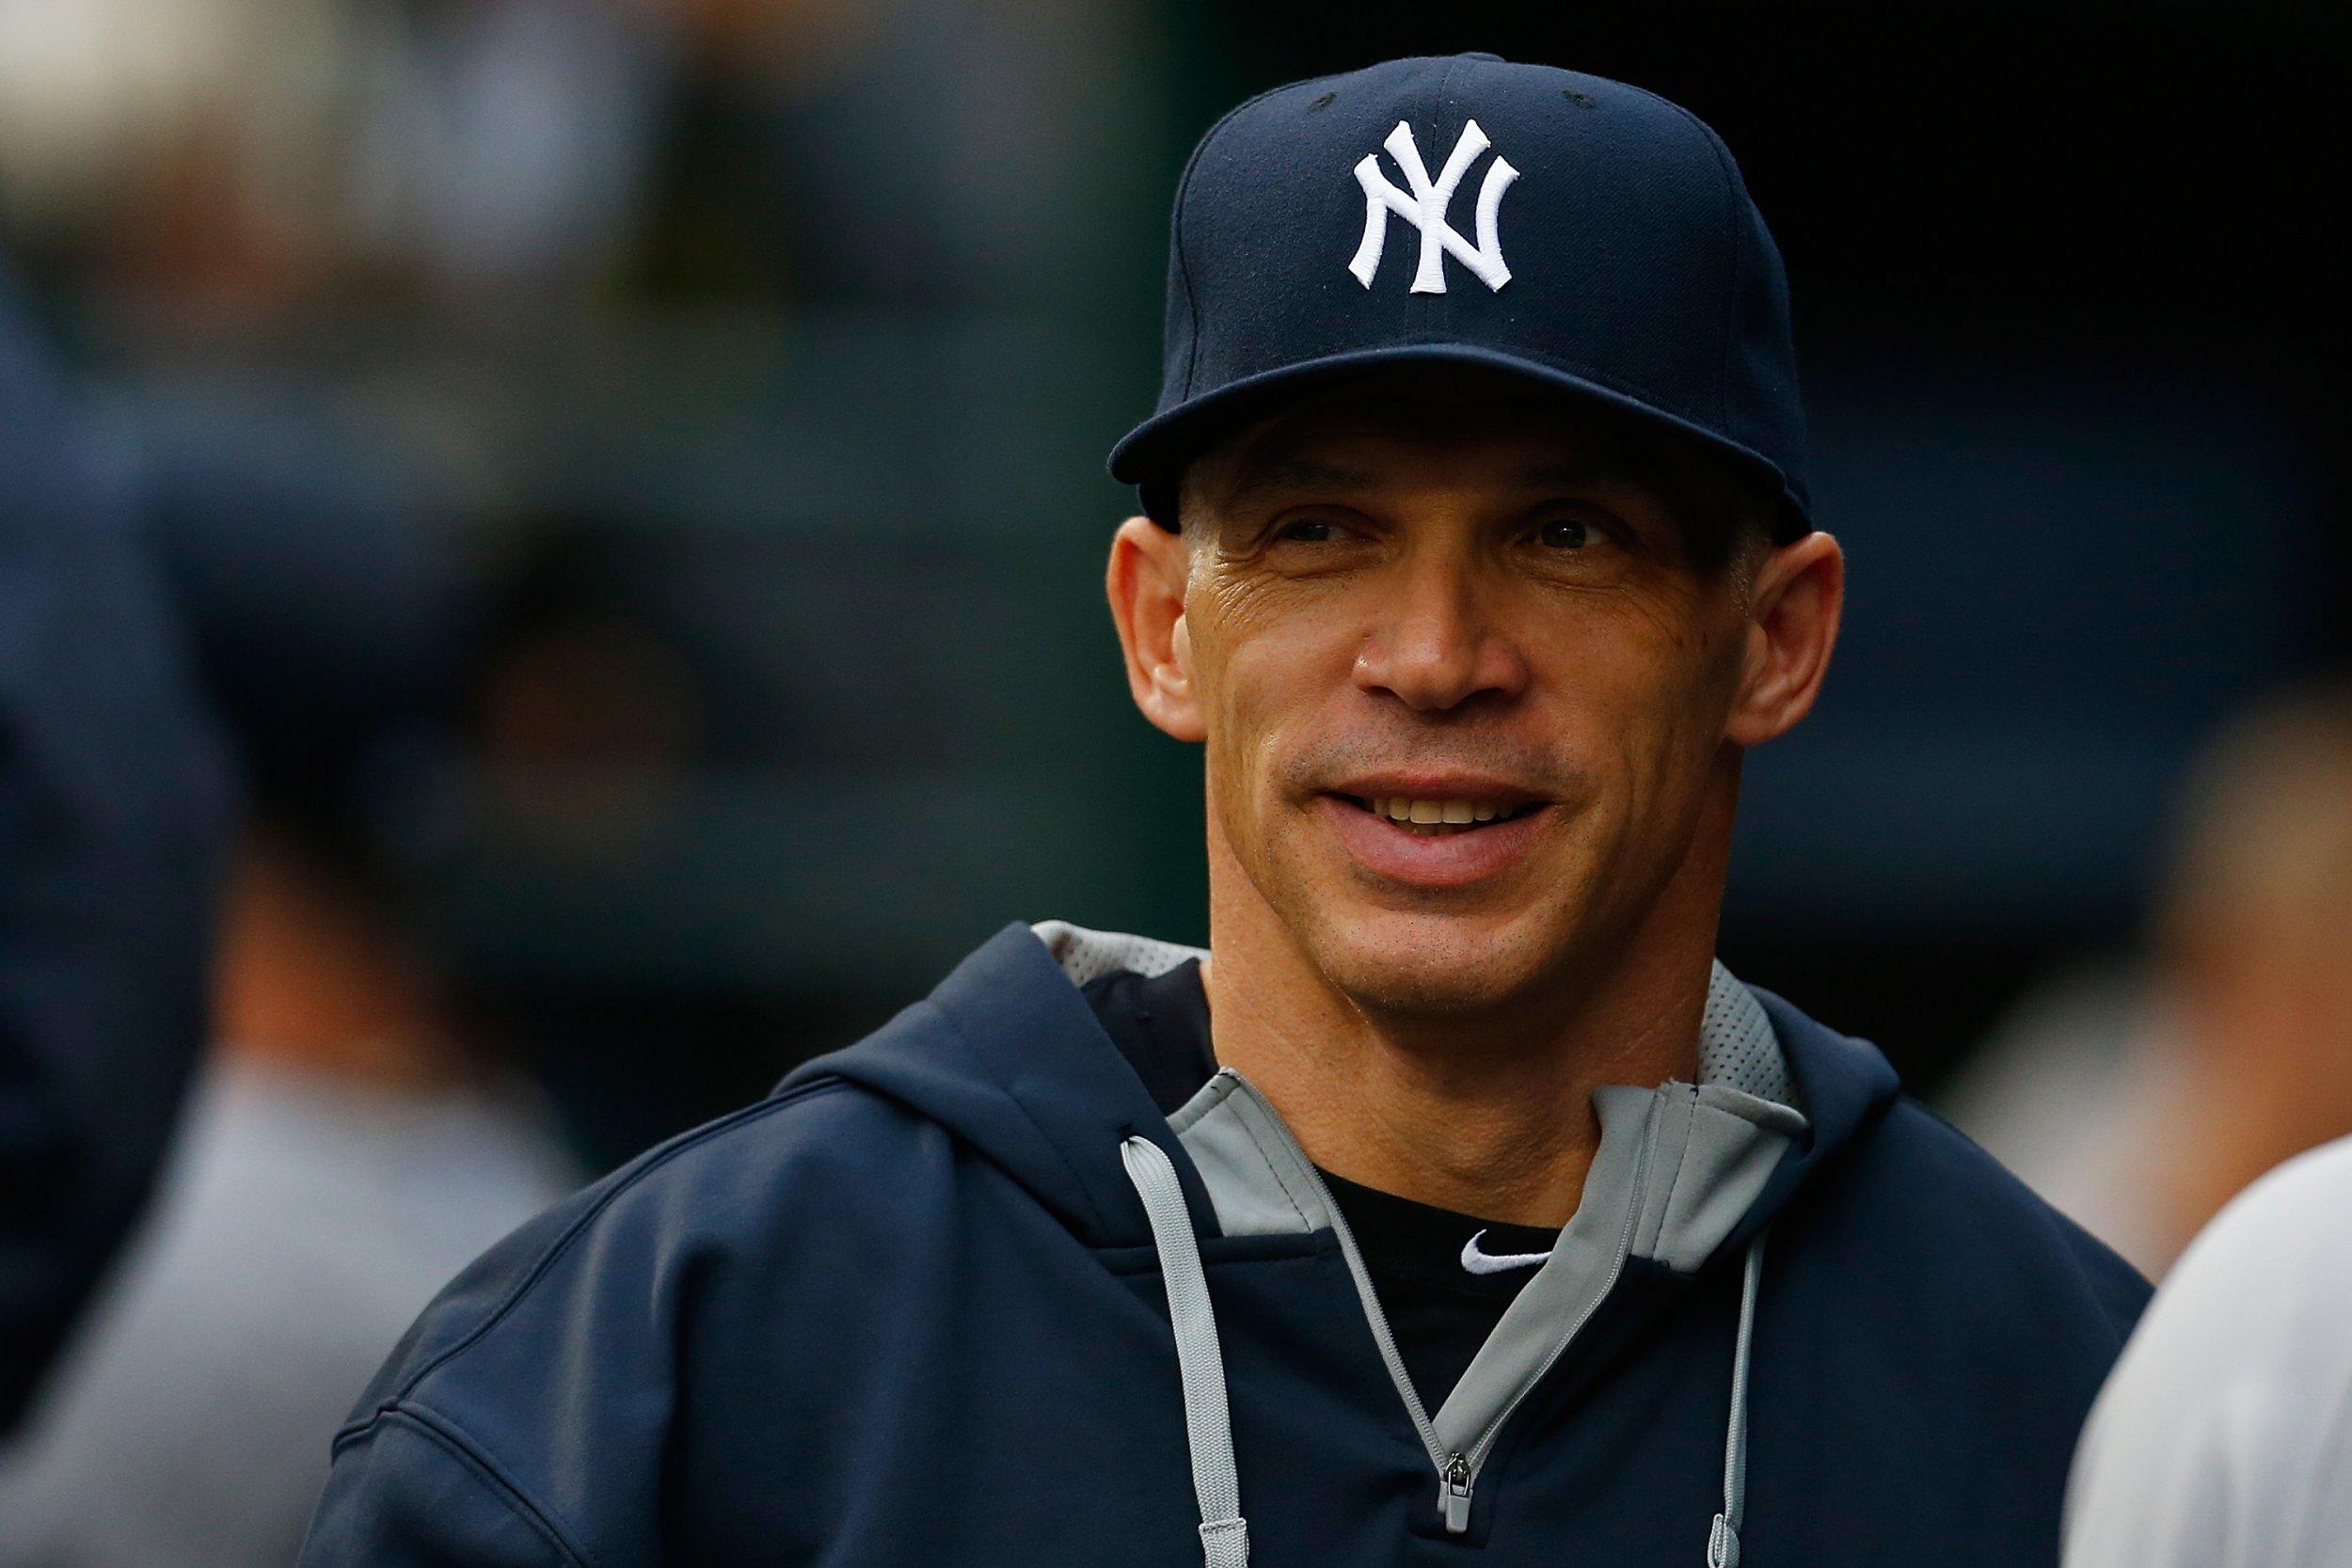 Yankees manager Joe Girardi.